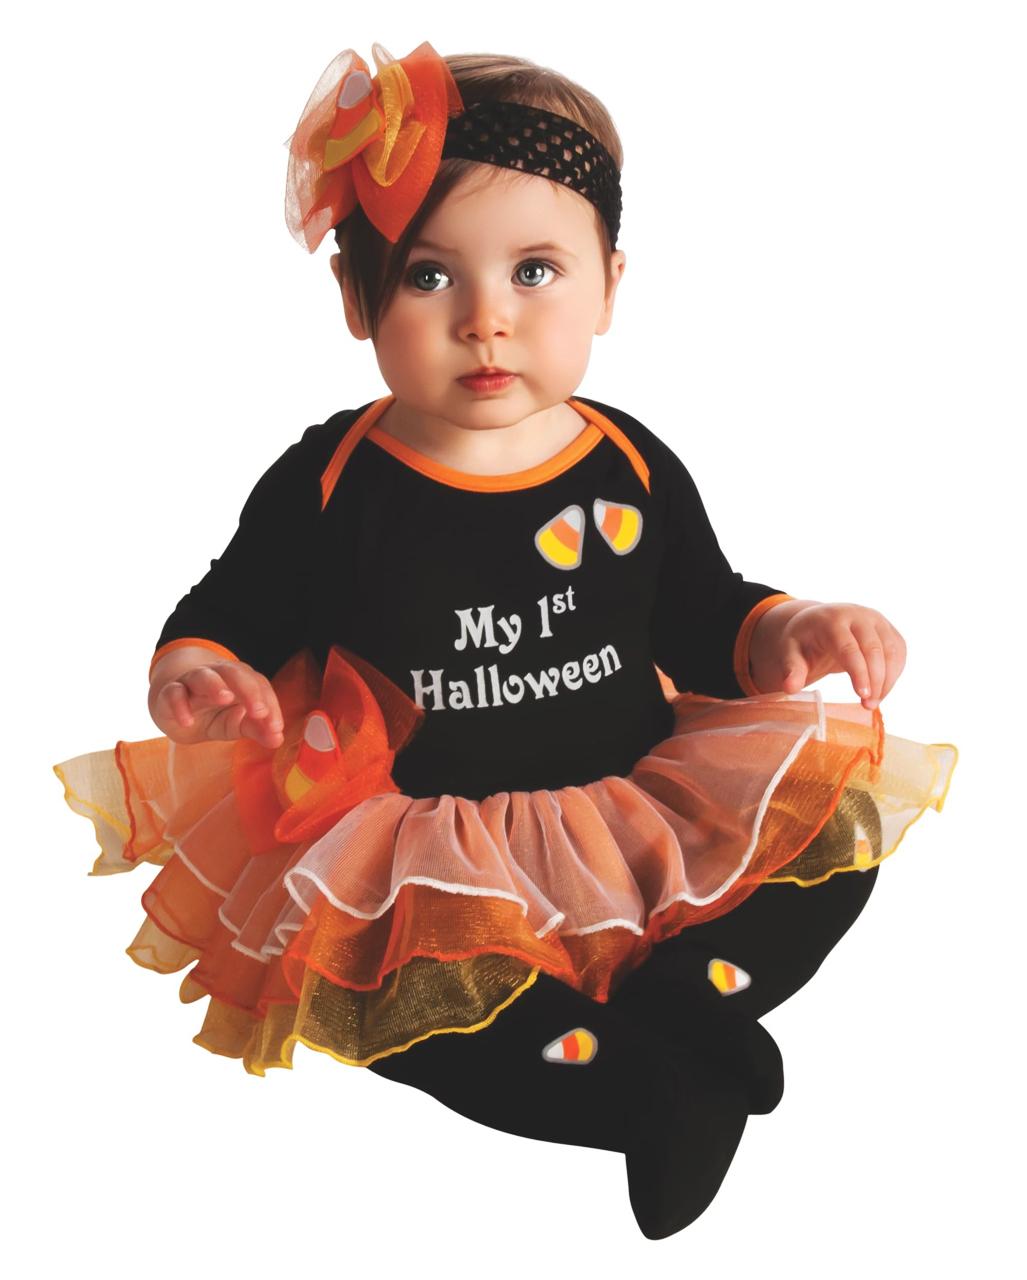 my first halloween baby costume infant halloween jumpsuit halloween romper suit horror. Black Bedroom Furniture Sets. Home Design Ideas